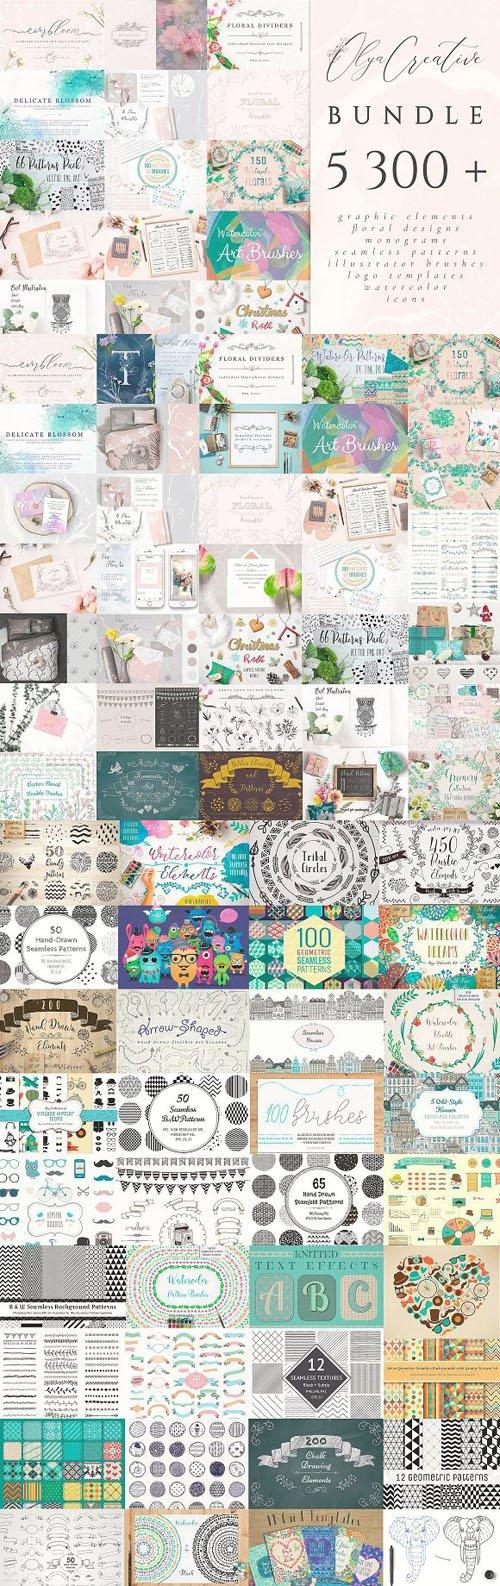 5300+ Graphic Bundle